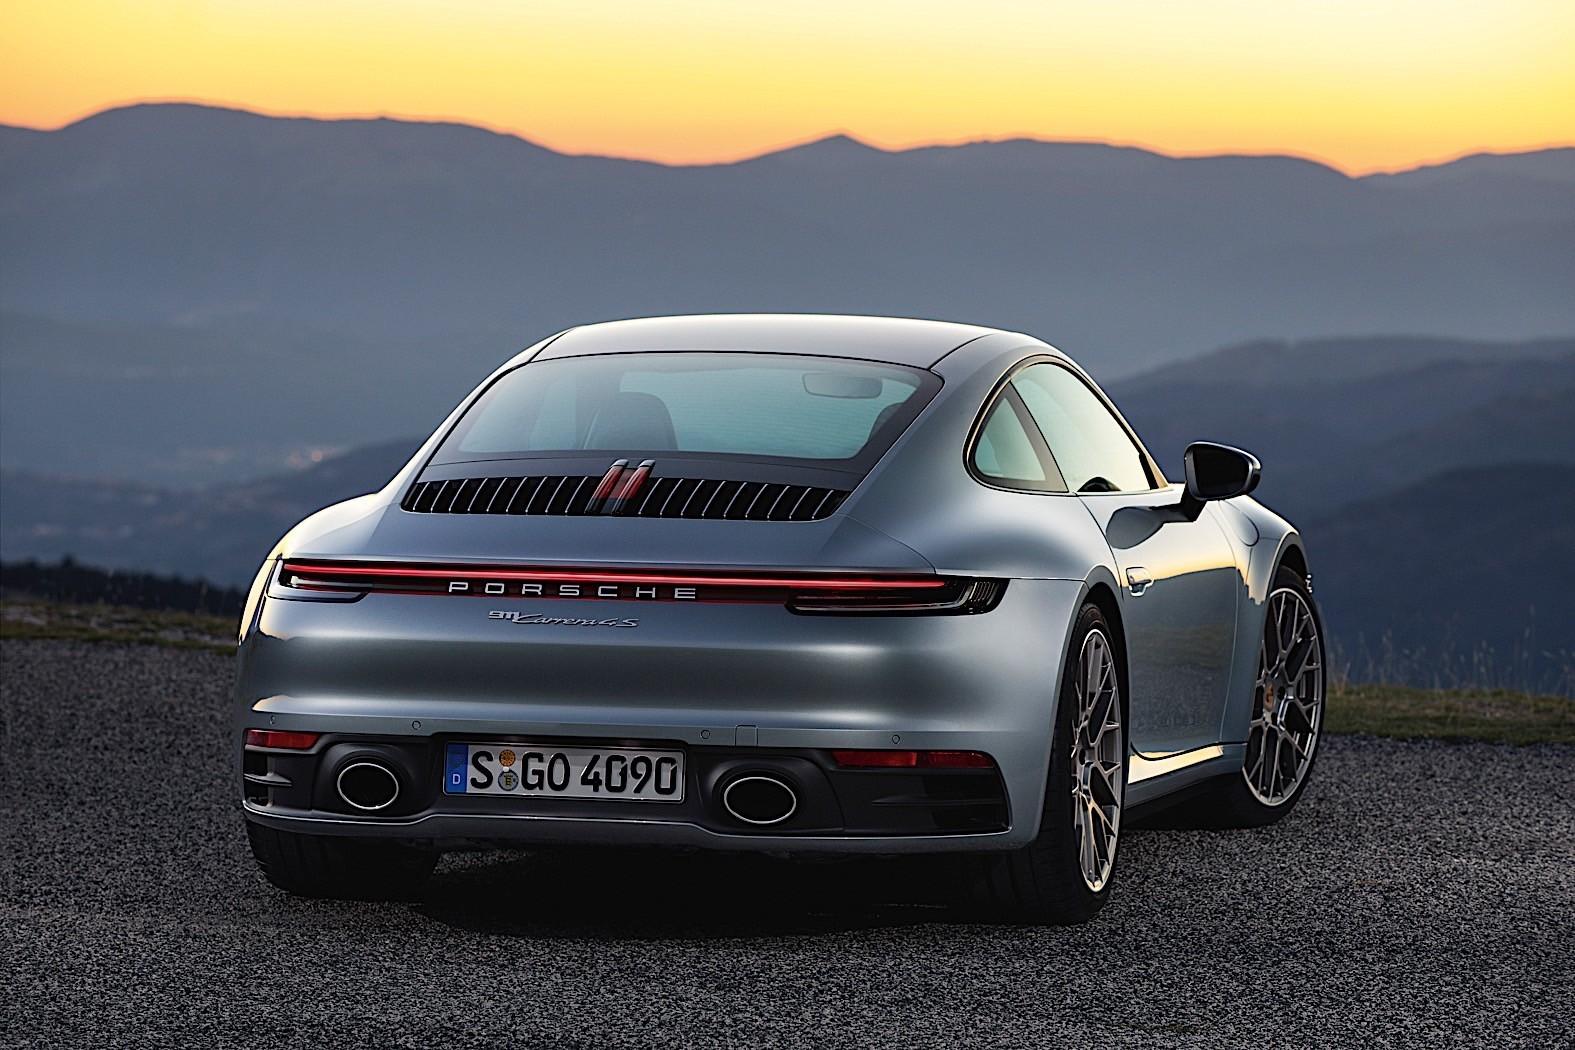 2020 Porsche 911 Carrera S Review Autoevolution